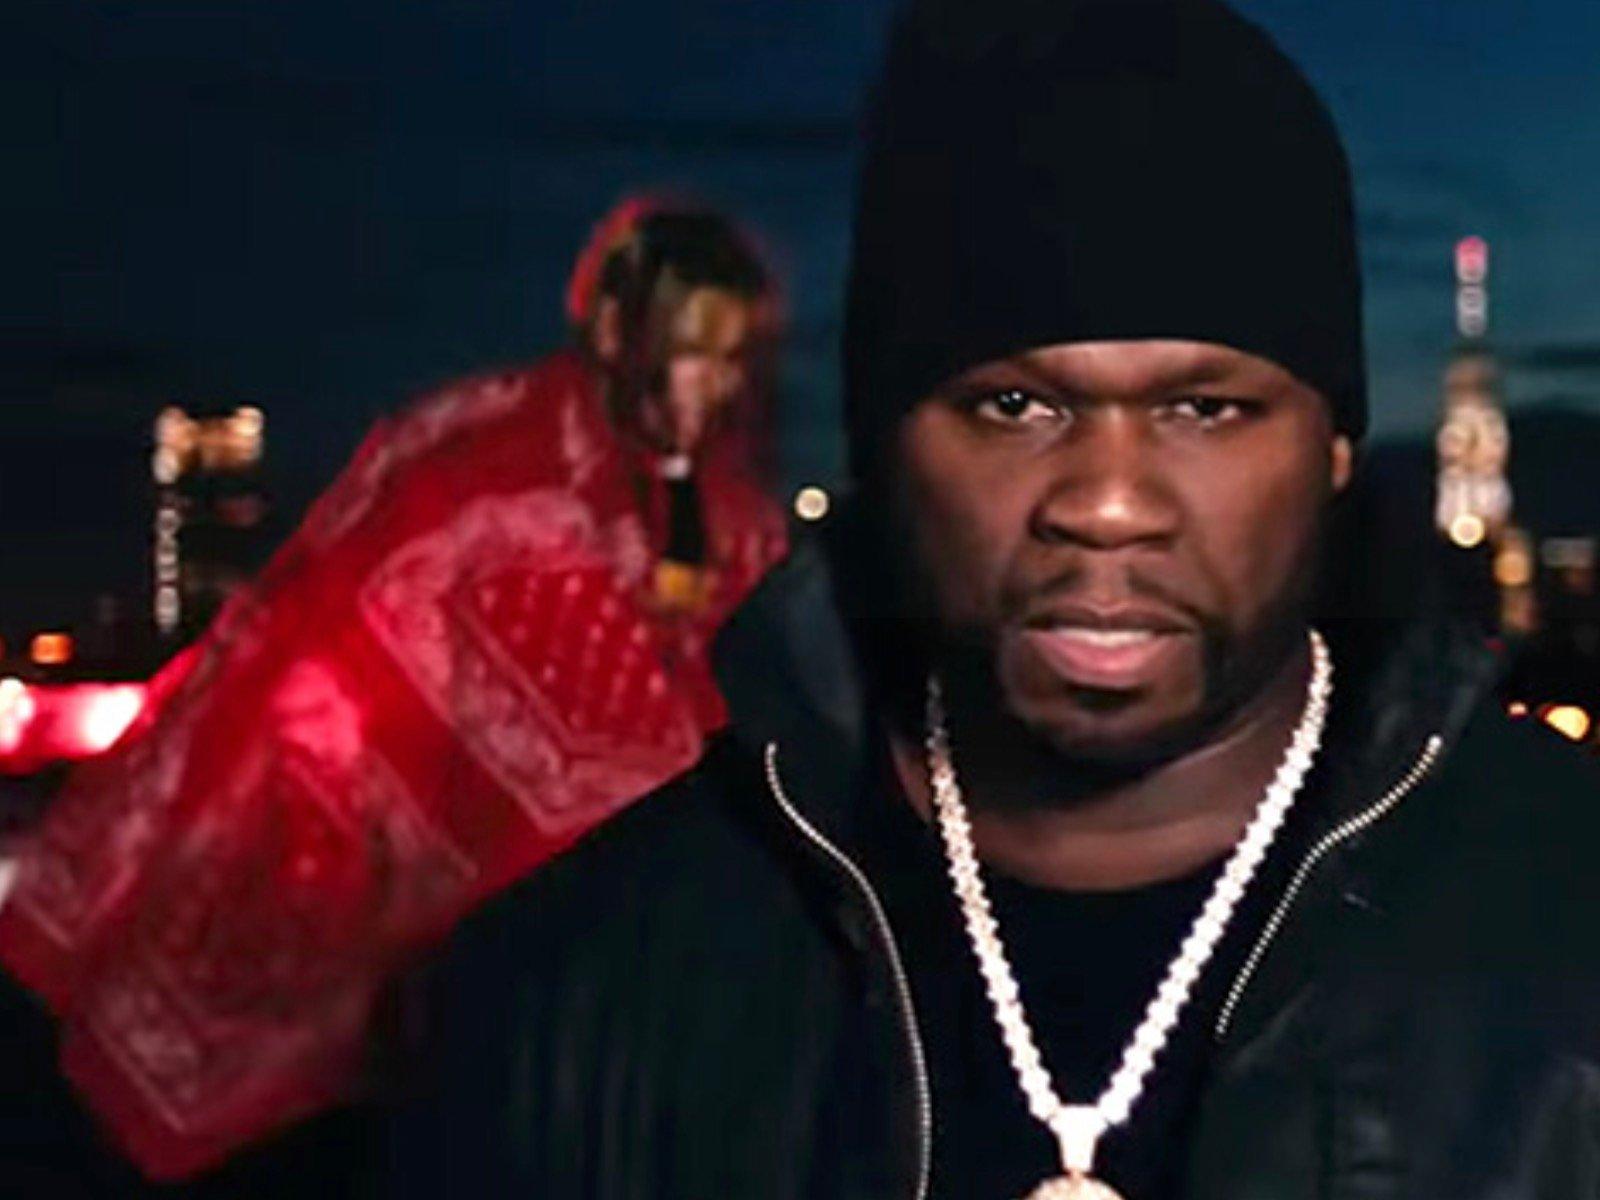 Tekashi 6ix9ine 50 Cent Get The Strap